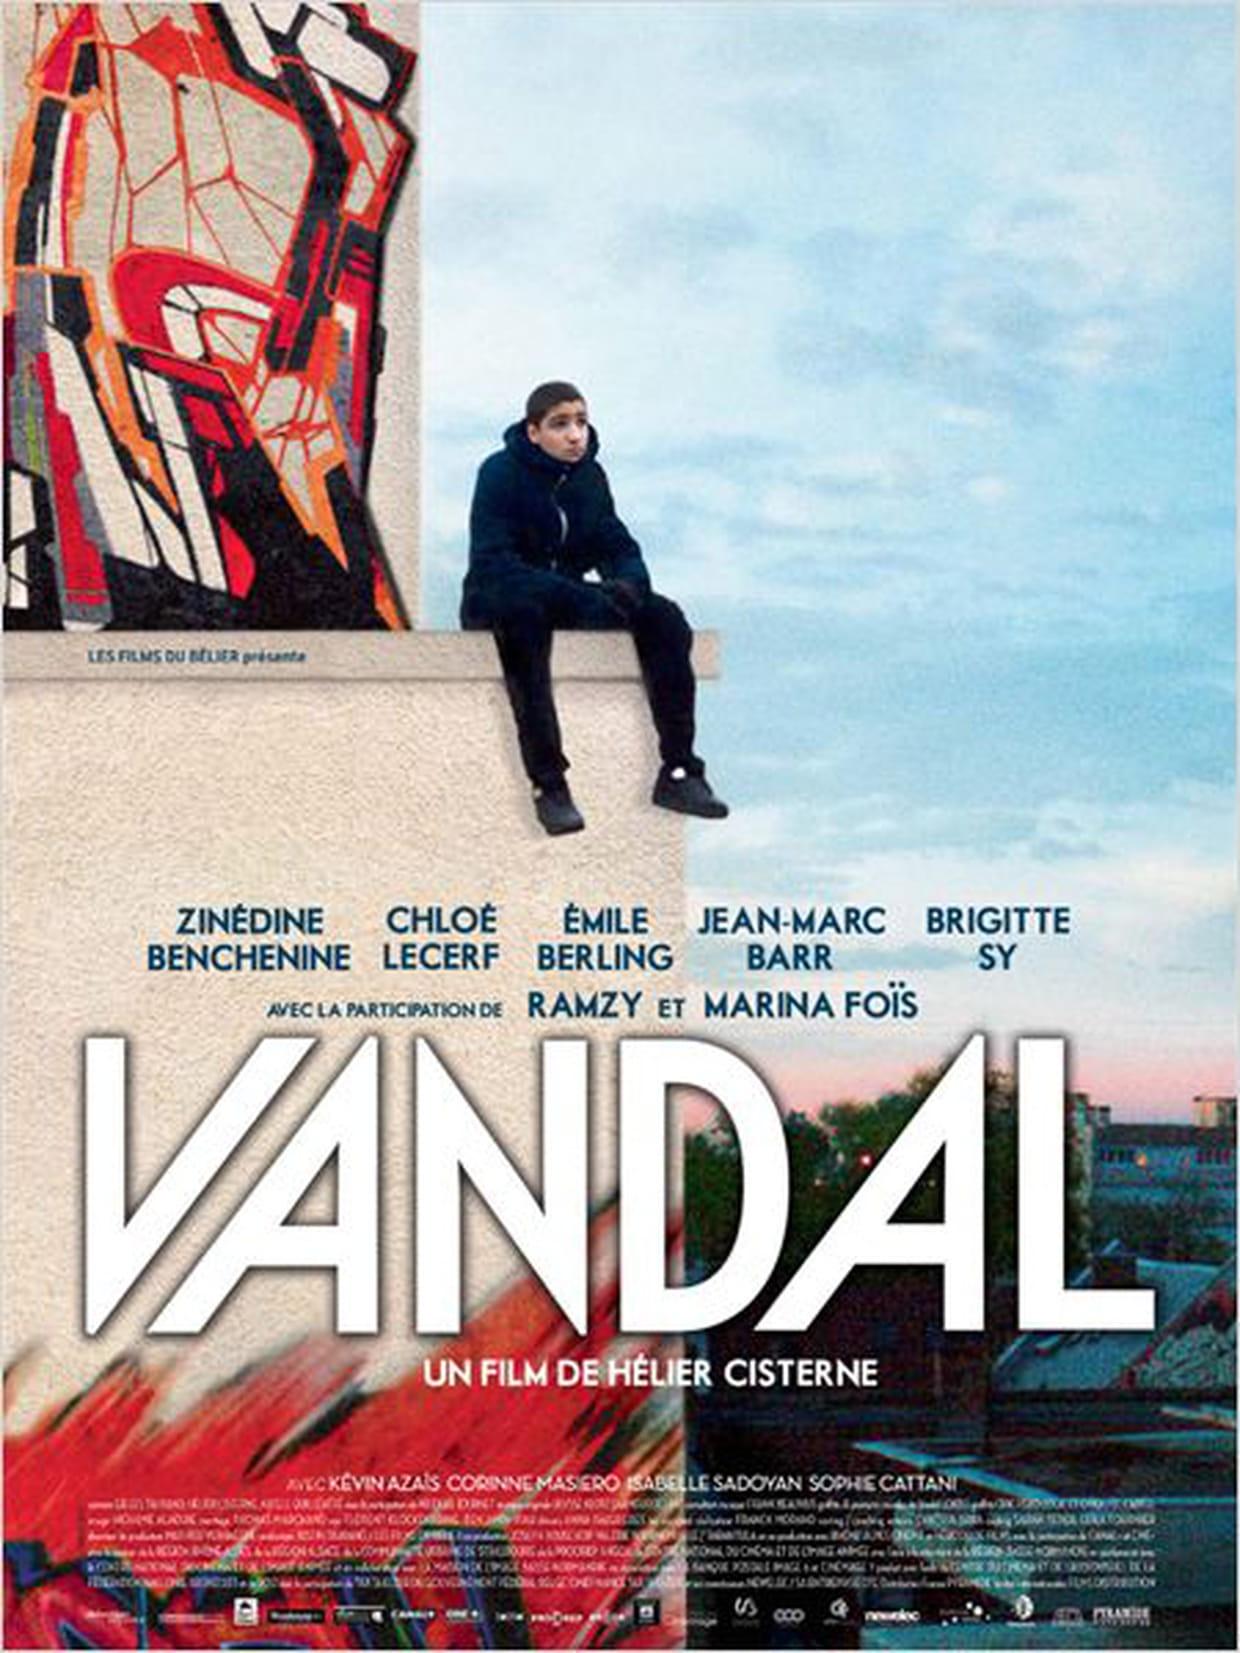 Vandal Bande Annonce Du Film Seances Streaming Sortie Avis